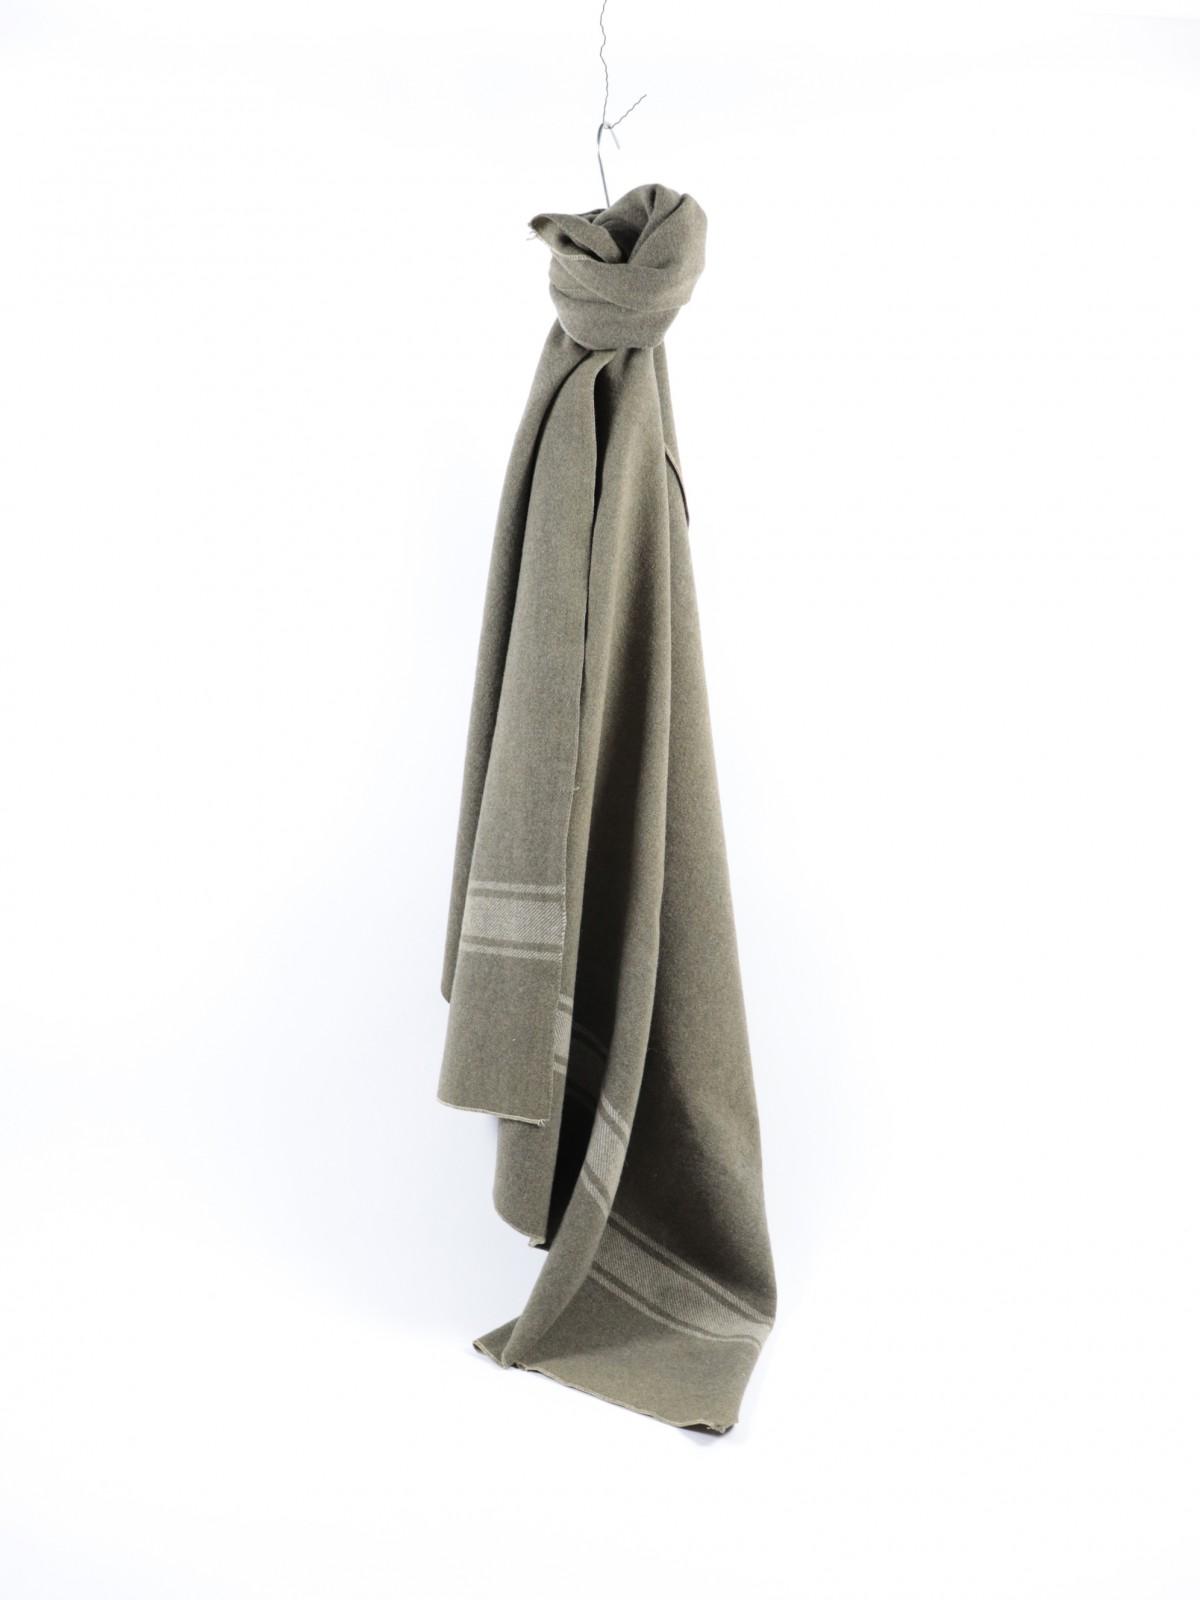 Italian miliary blanket